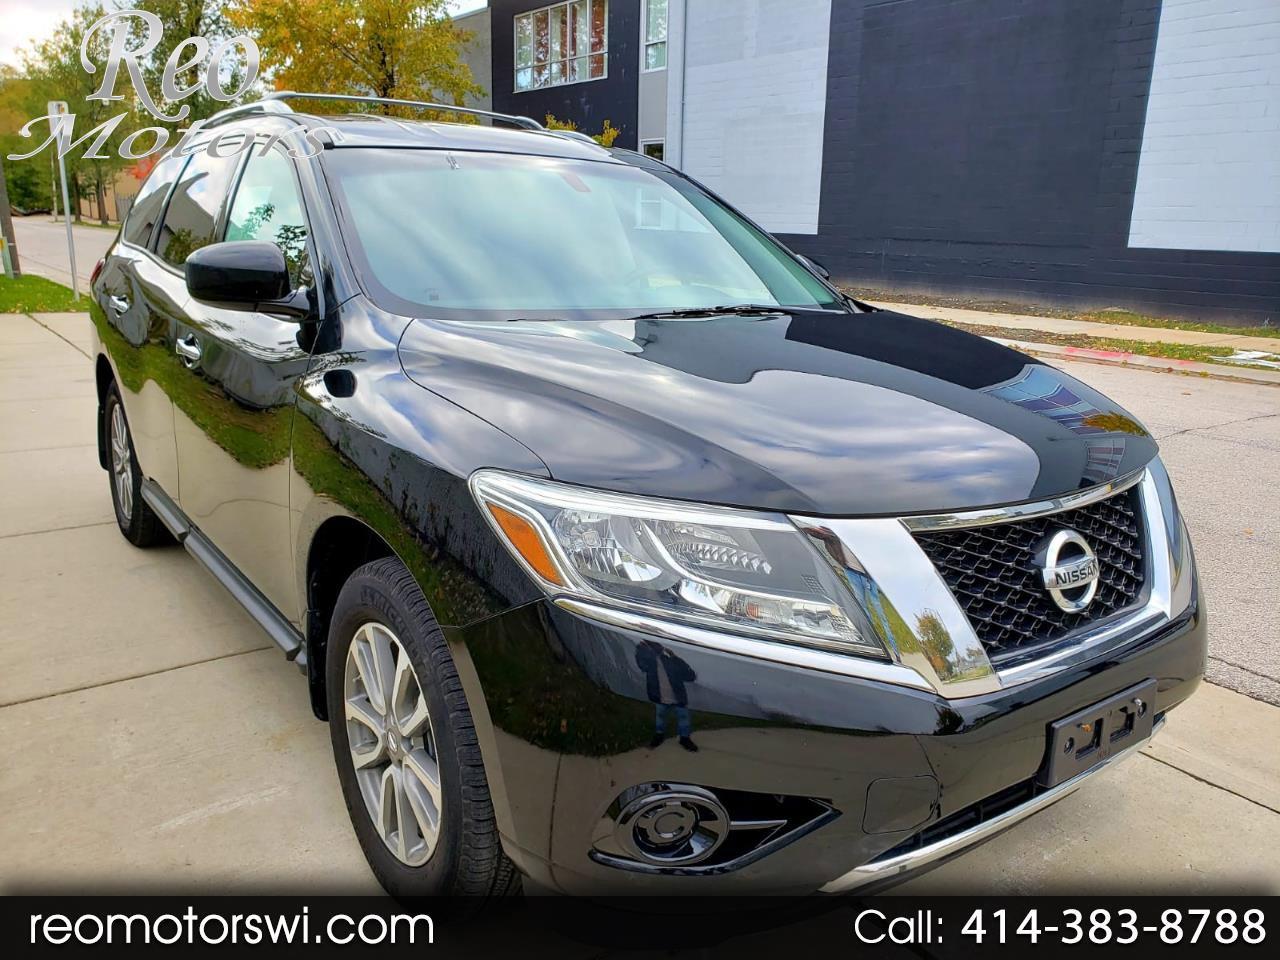 2013 Nissan Pathfinder 4WD SV image